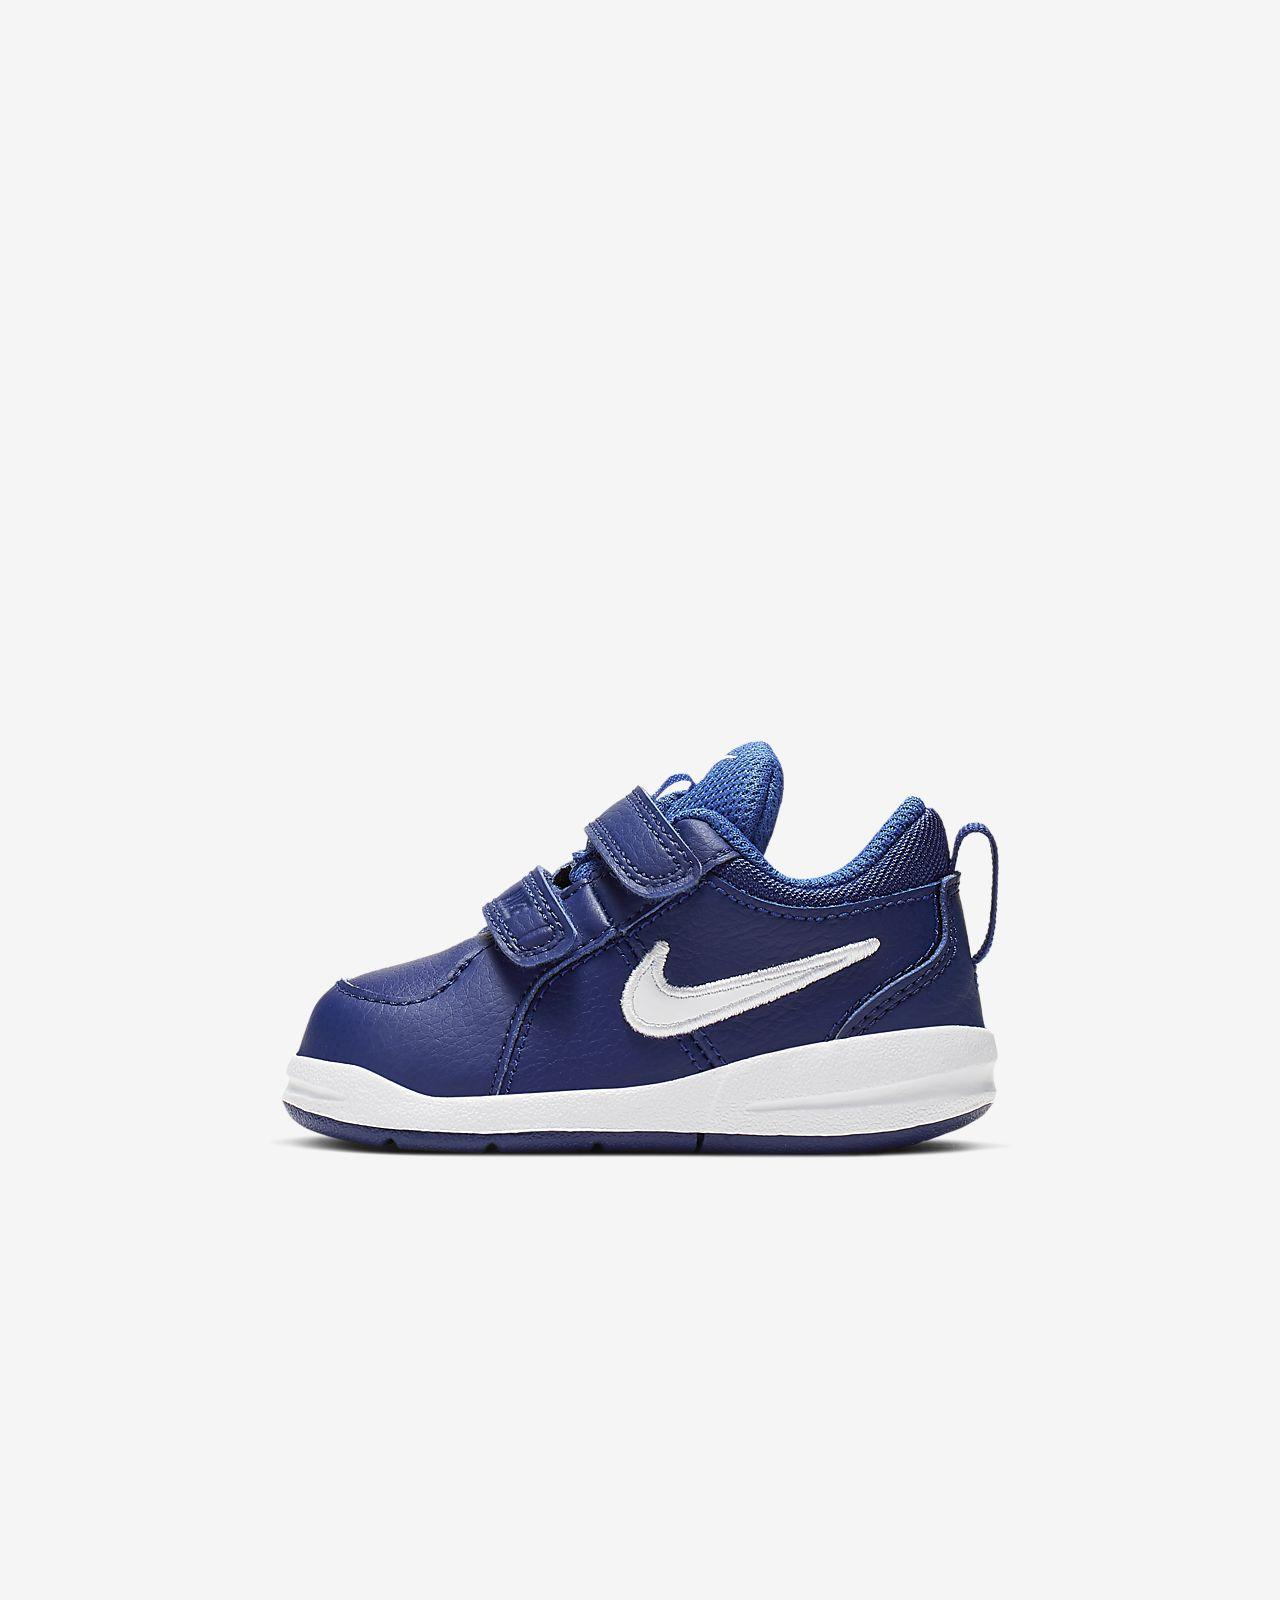 95c4666c39d39 new styles 64855 1aa00 nike court royale tdv white toddler boys sneakers sz  7 8 - dinglesnorthshore.com